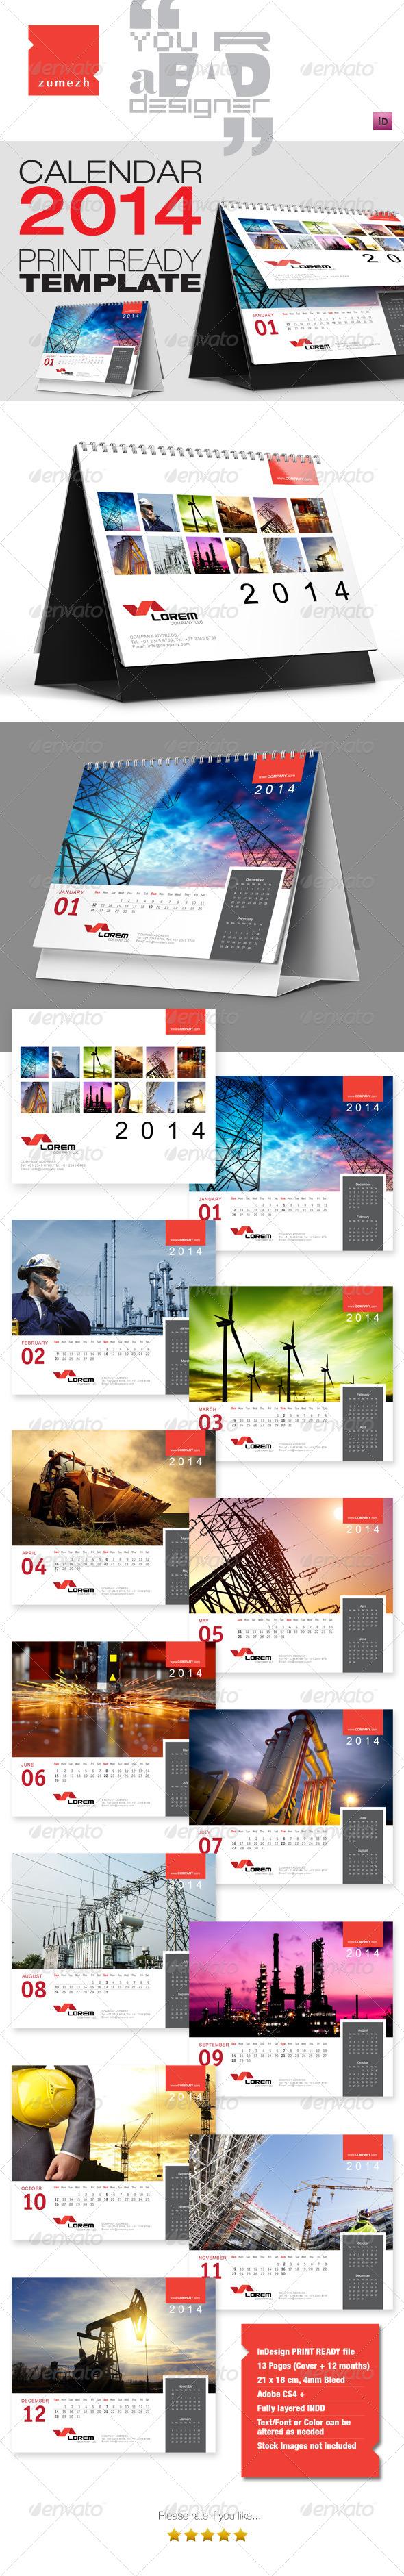 GraphicRiver Premium Desktop Calendar 2014 6232209